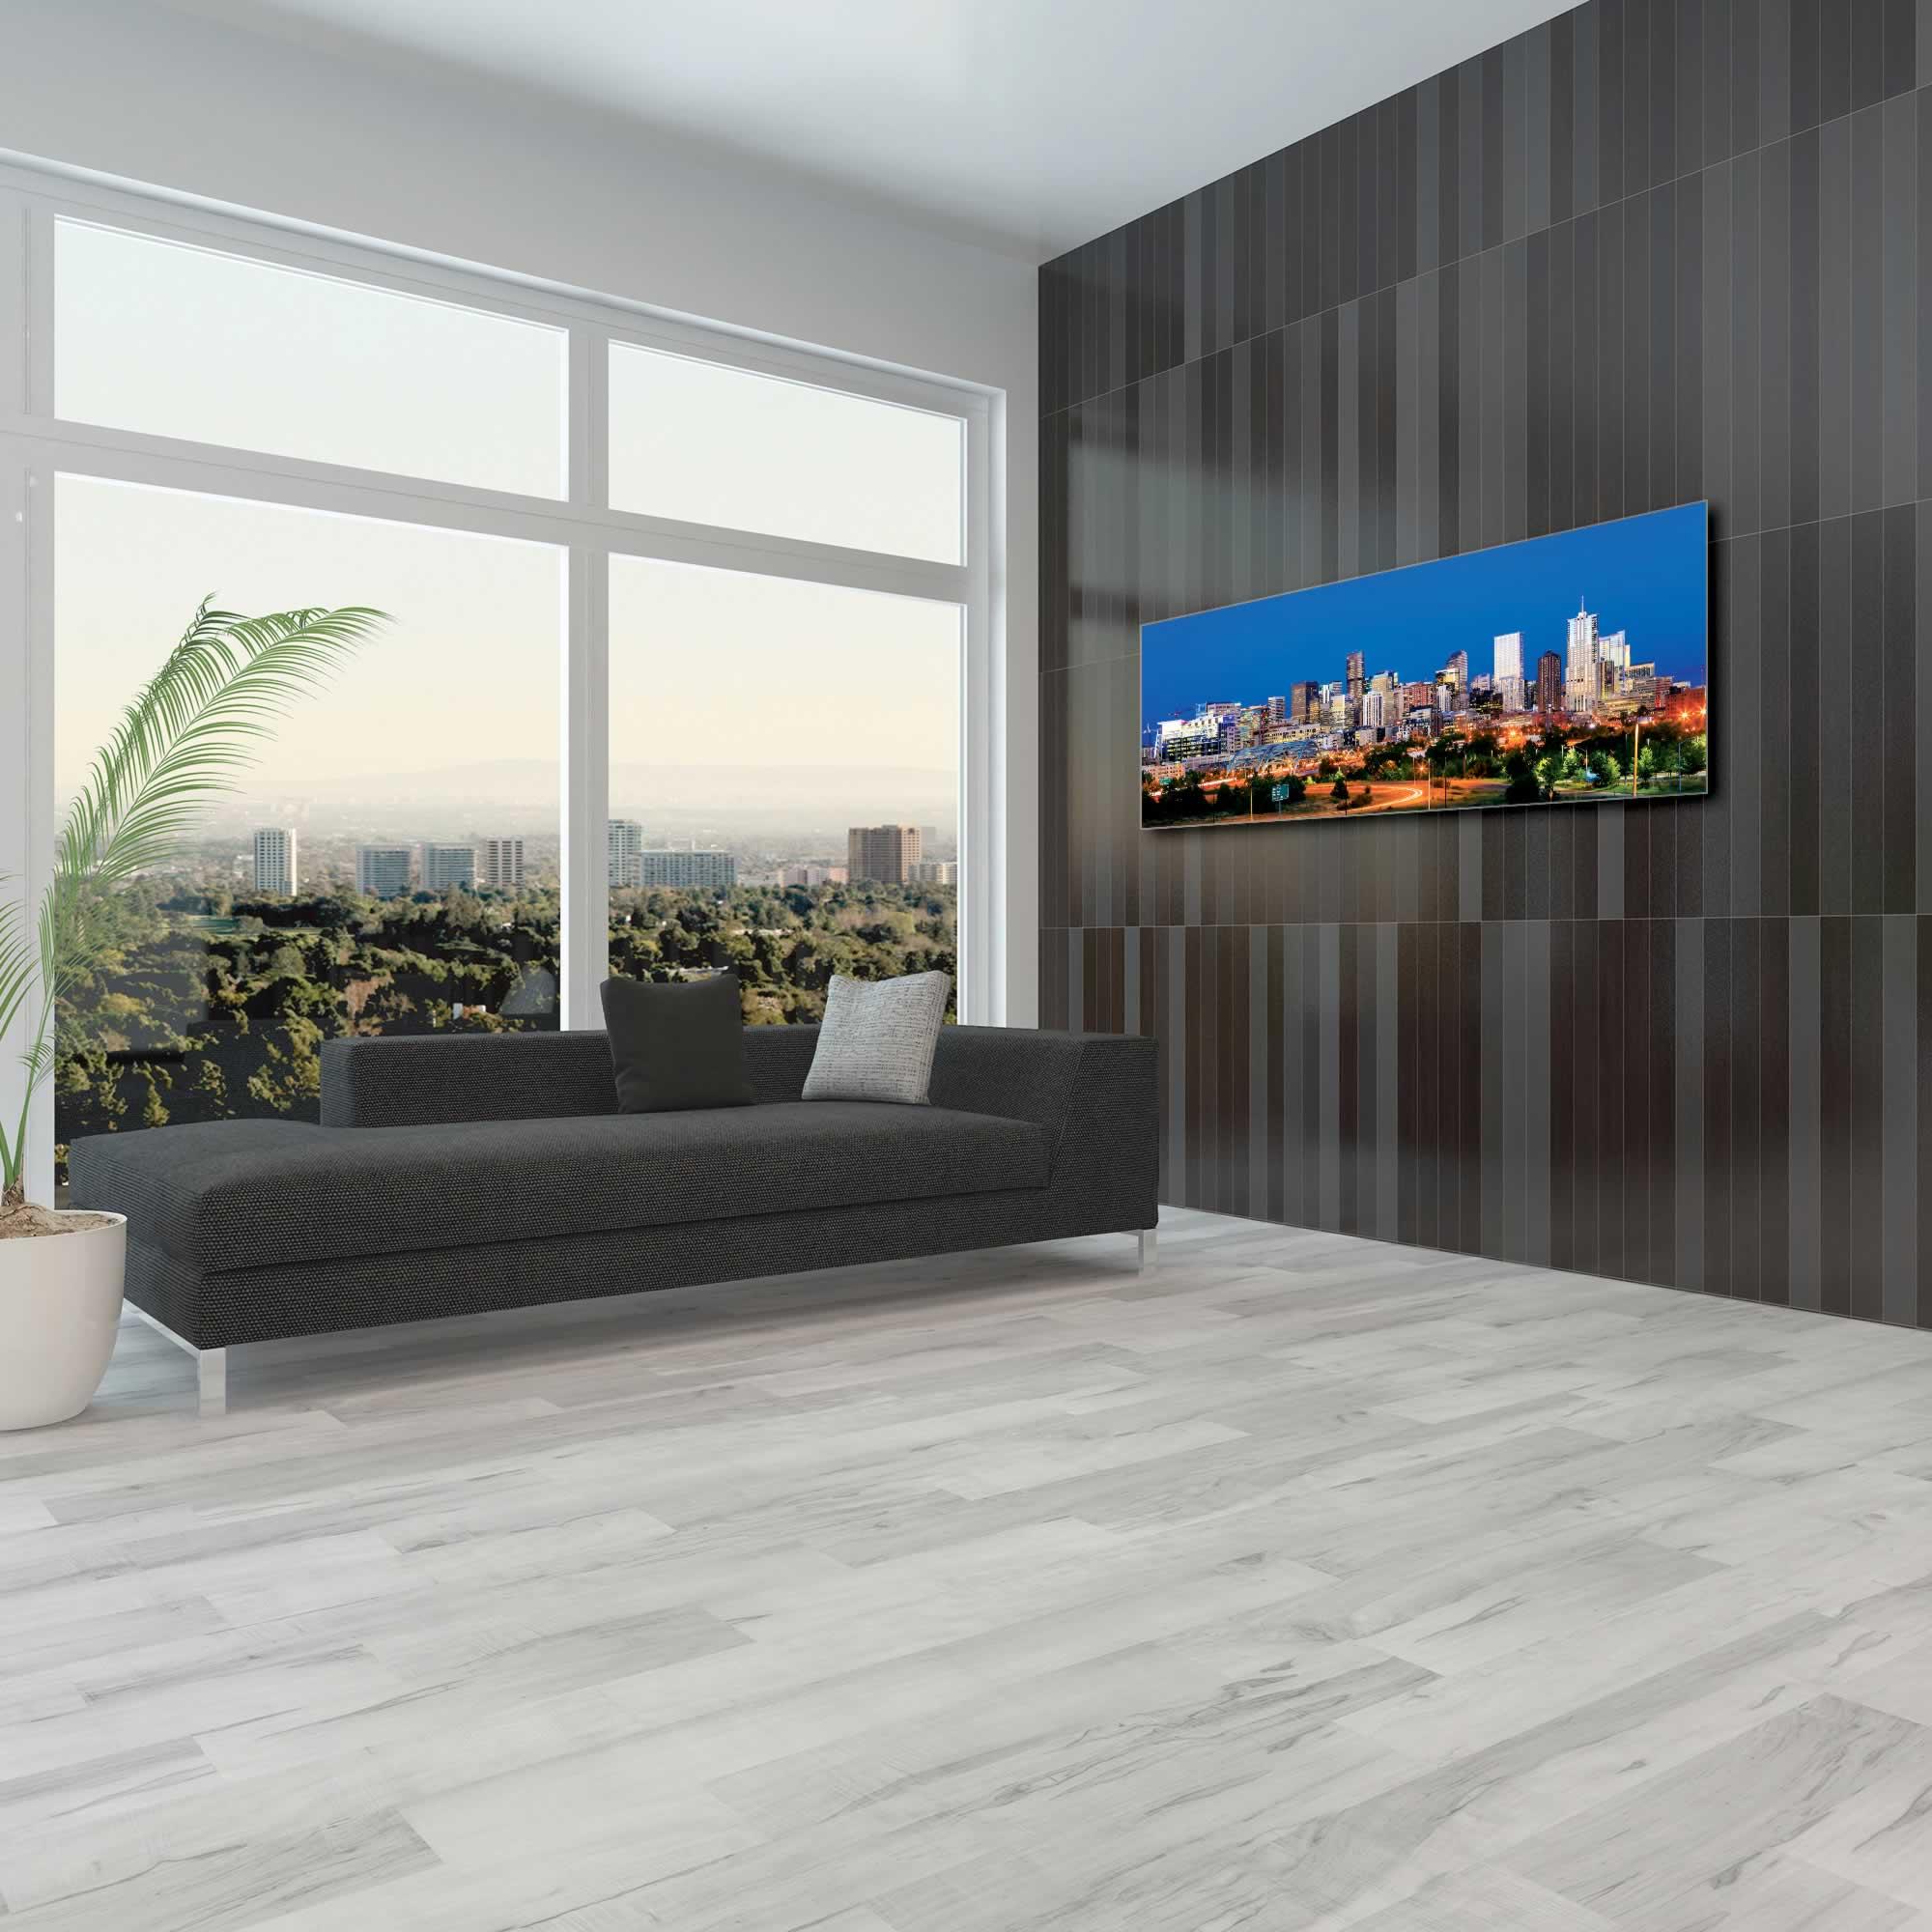 Denver City Skyline - Urban Modern Art, Designer Home Decor, Cityscape Wall Artwork, Trendy Contemporary Art - Alternate View 1